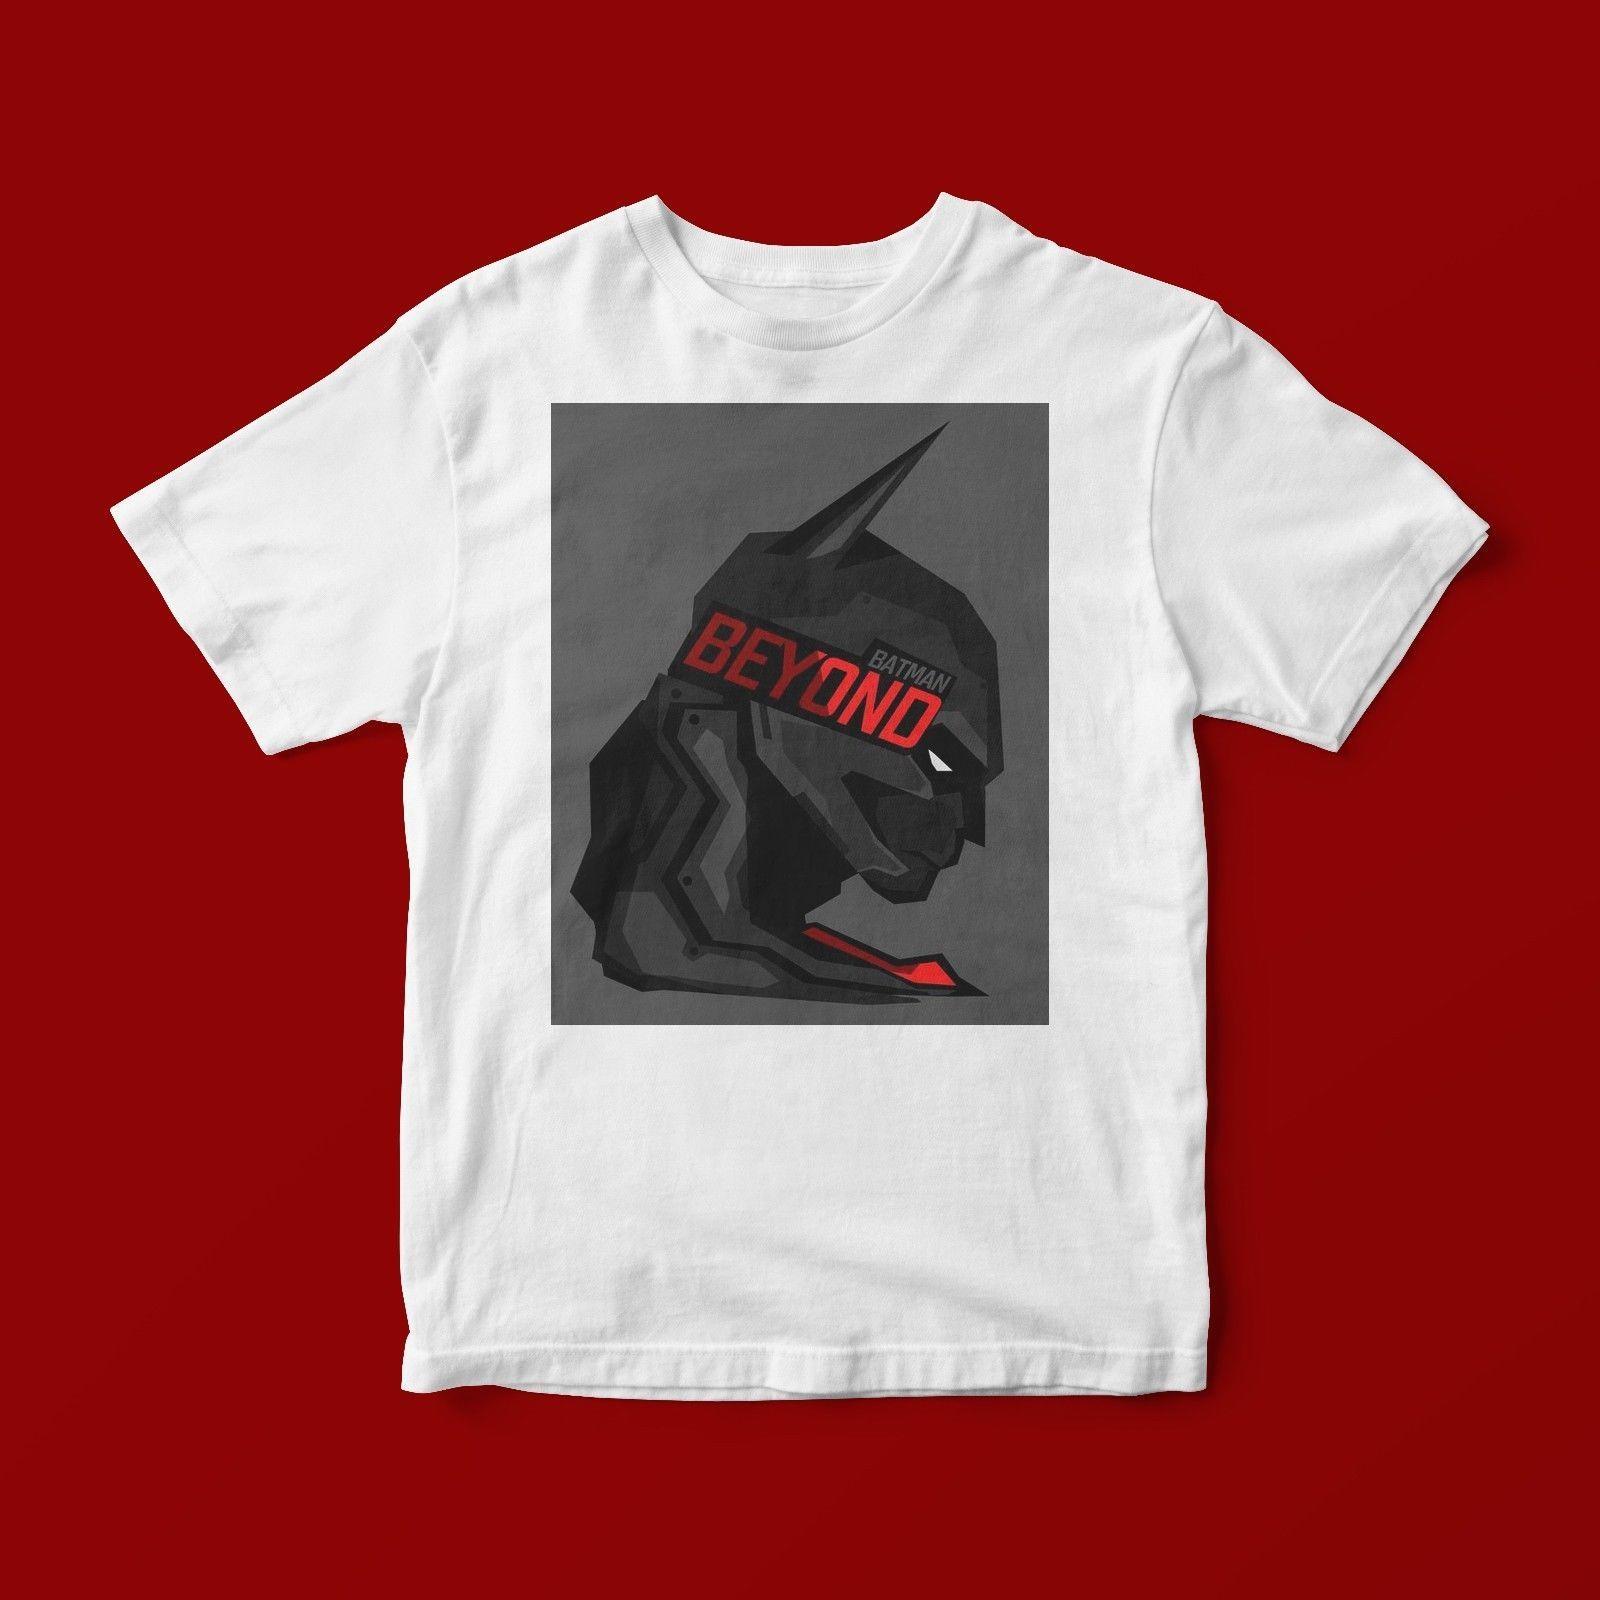 8c37303cd BATMAN BEYOND ART T SHIRT UNISEX 253 Tshirt Tops Summer Cool Funny Cartoon  Character Cool Looking T Shirts Buy Designer Shirts From Luckytomorrow, ...